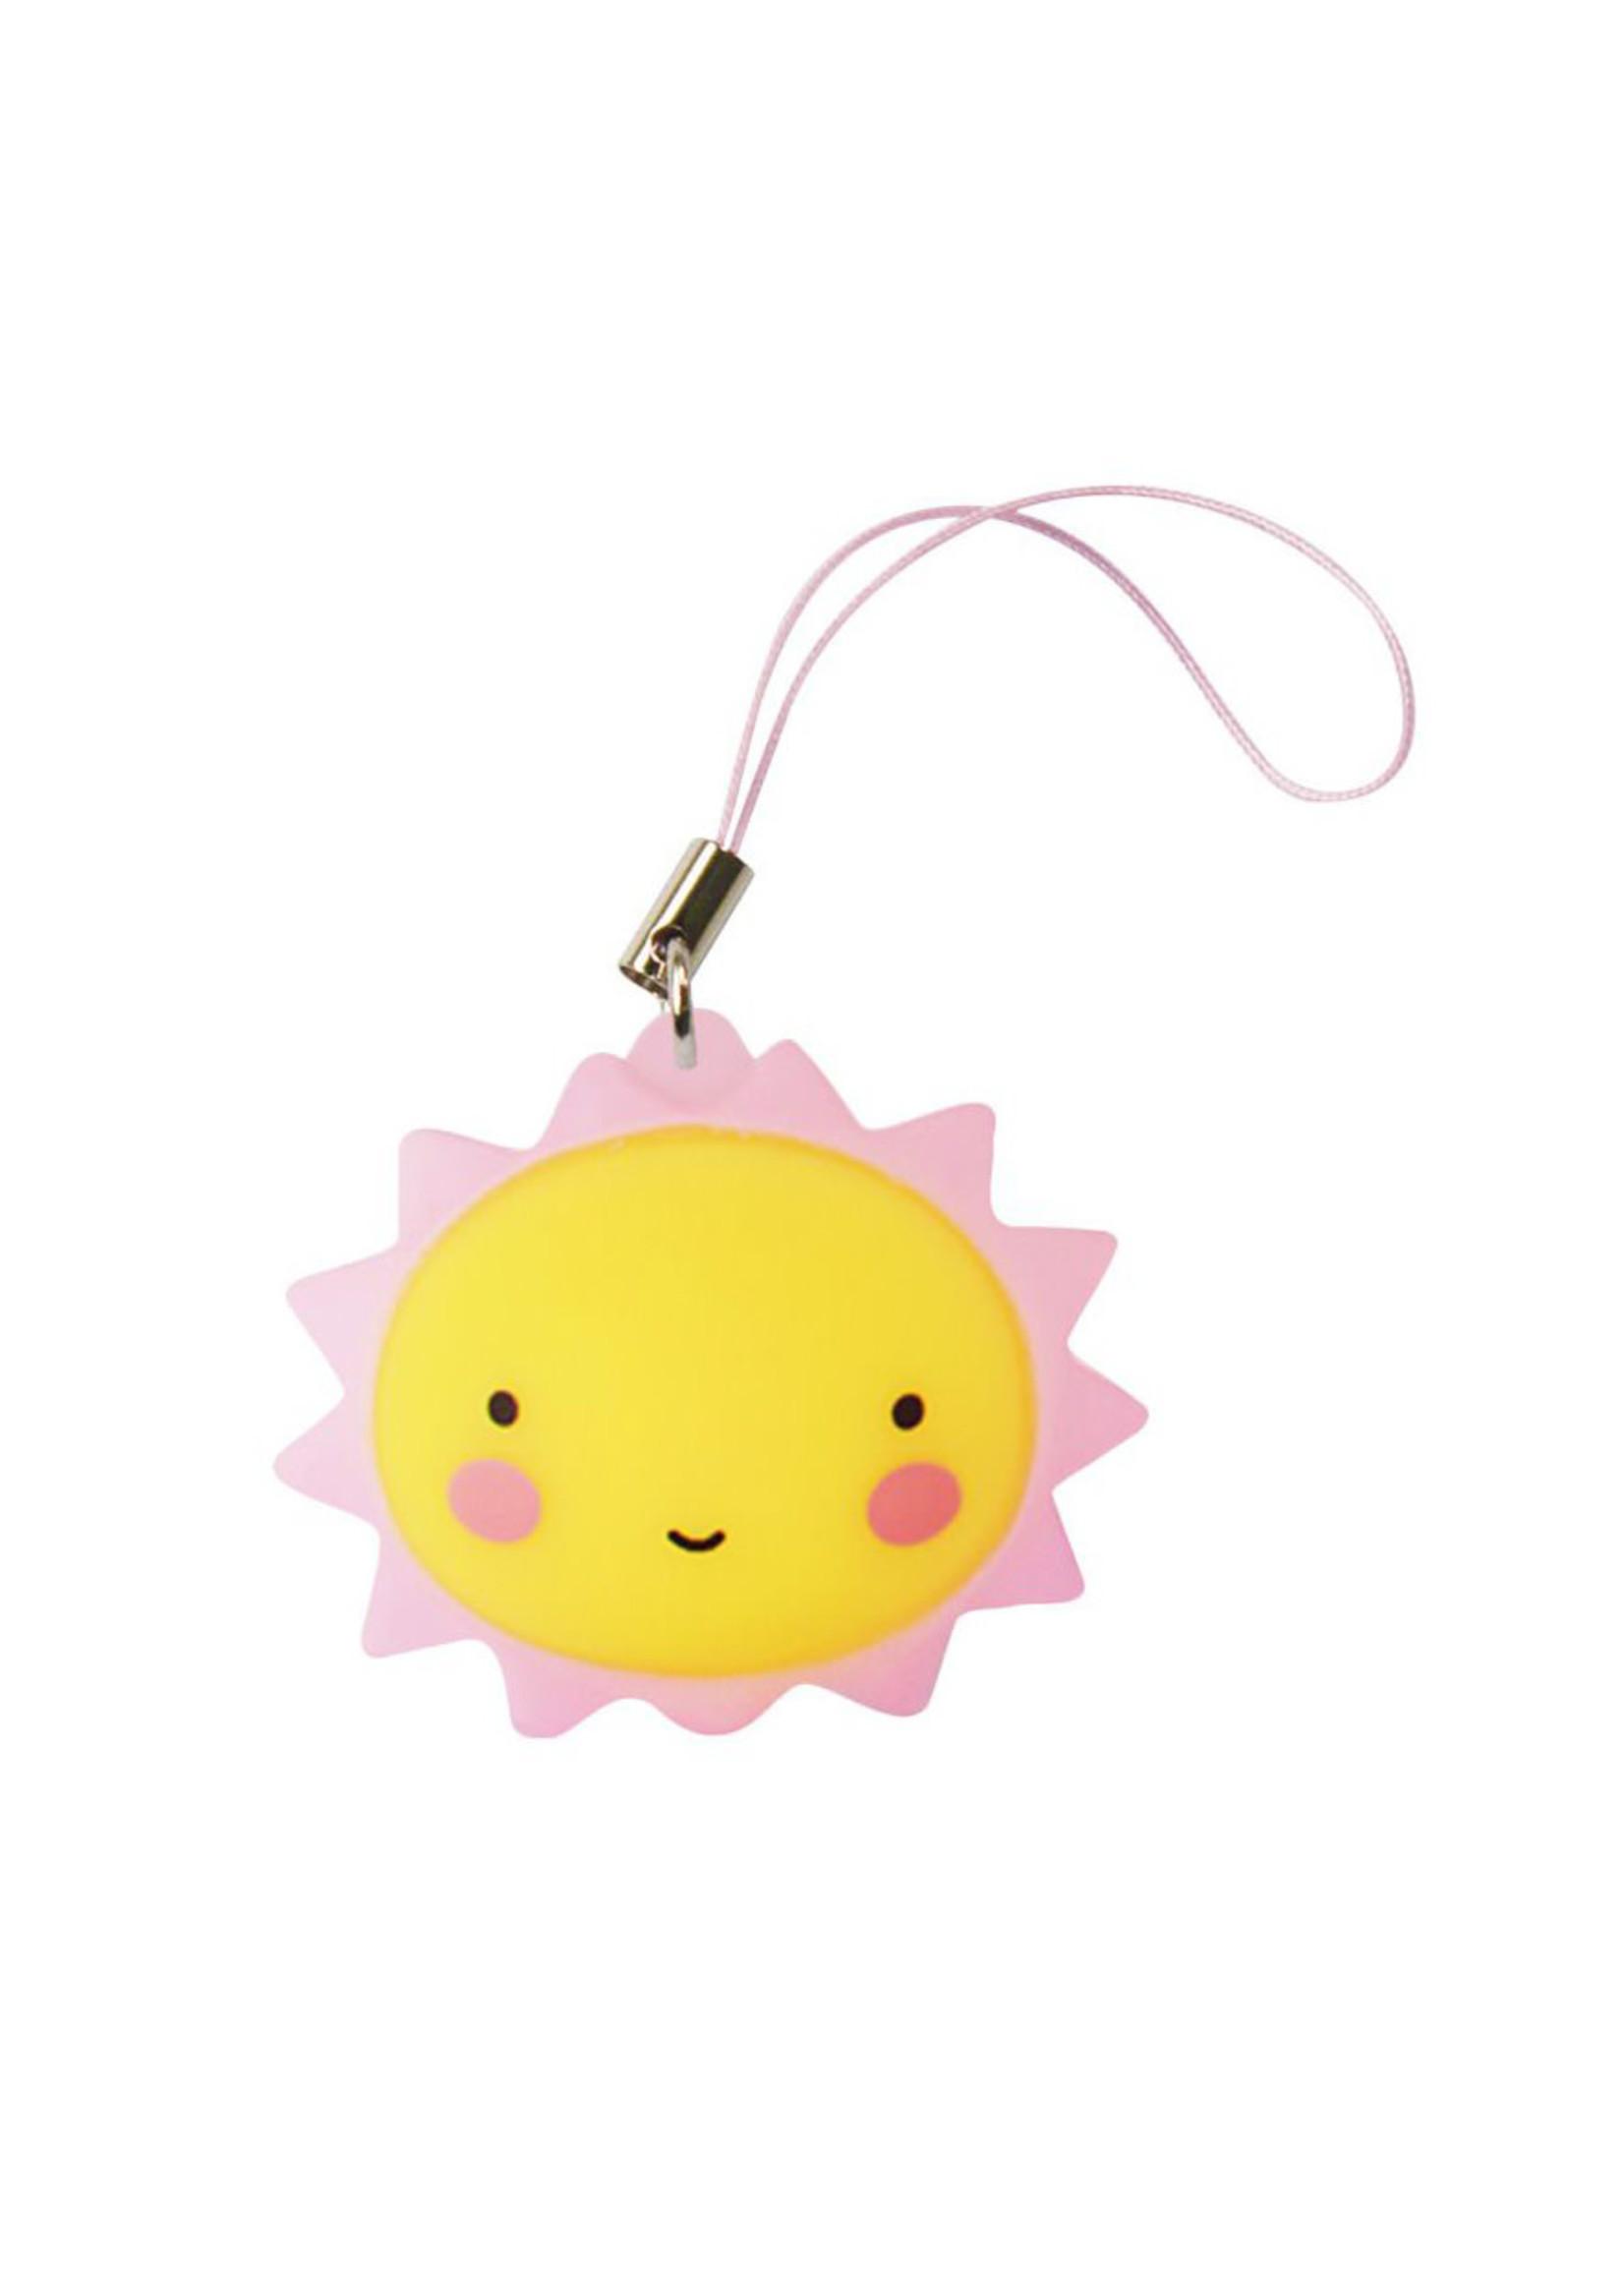 A Little Lovely Co. LLC Sun Charm